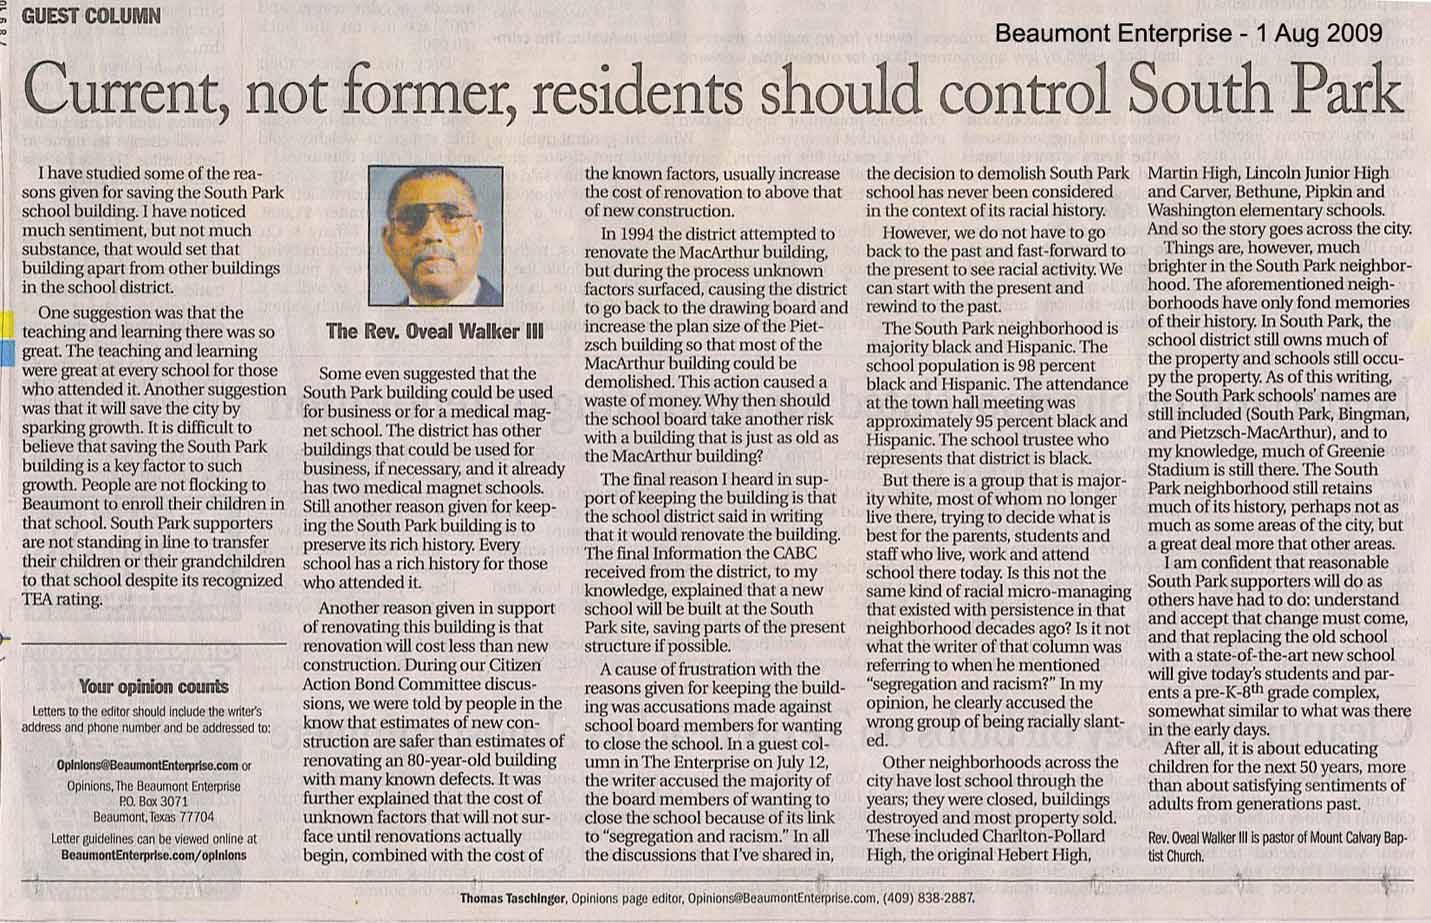 southeasttexas political review